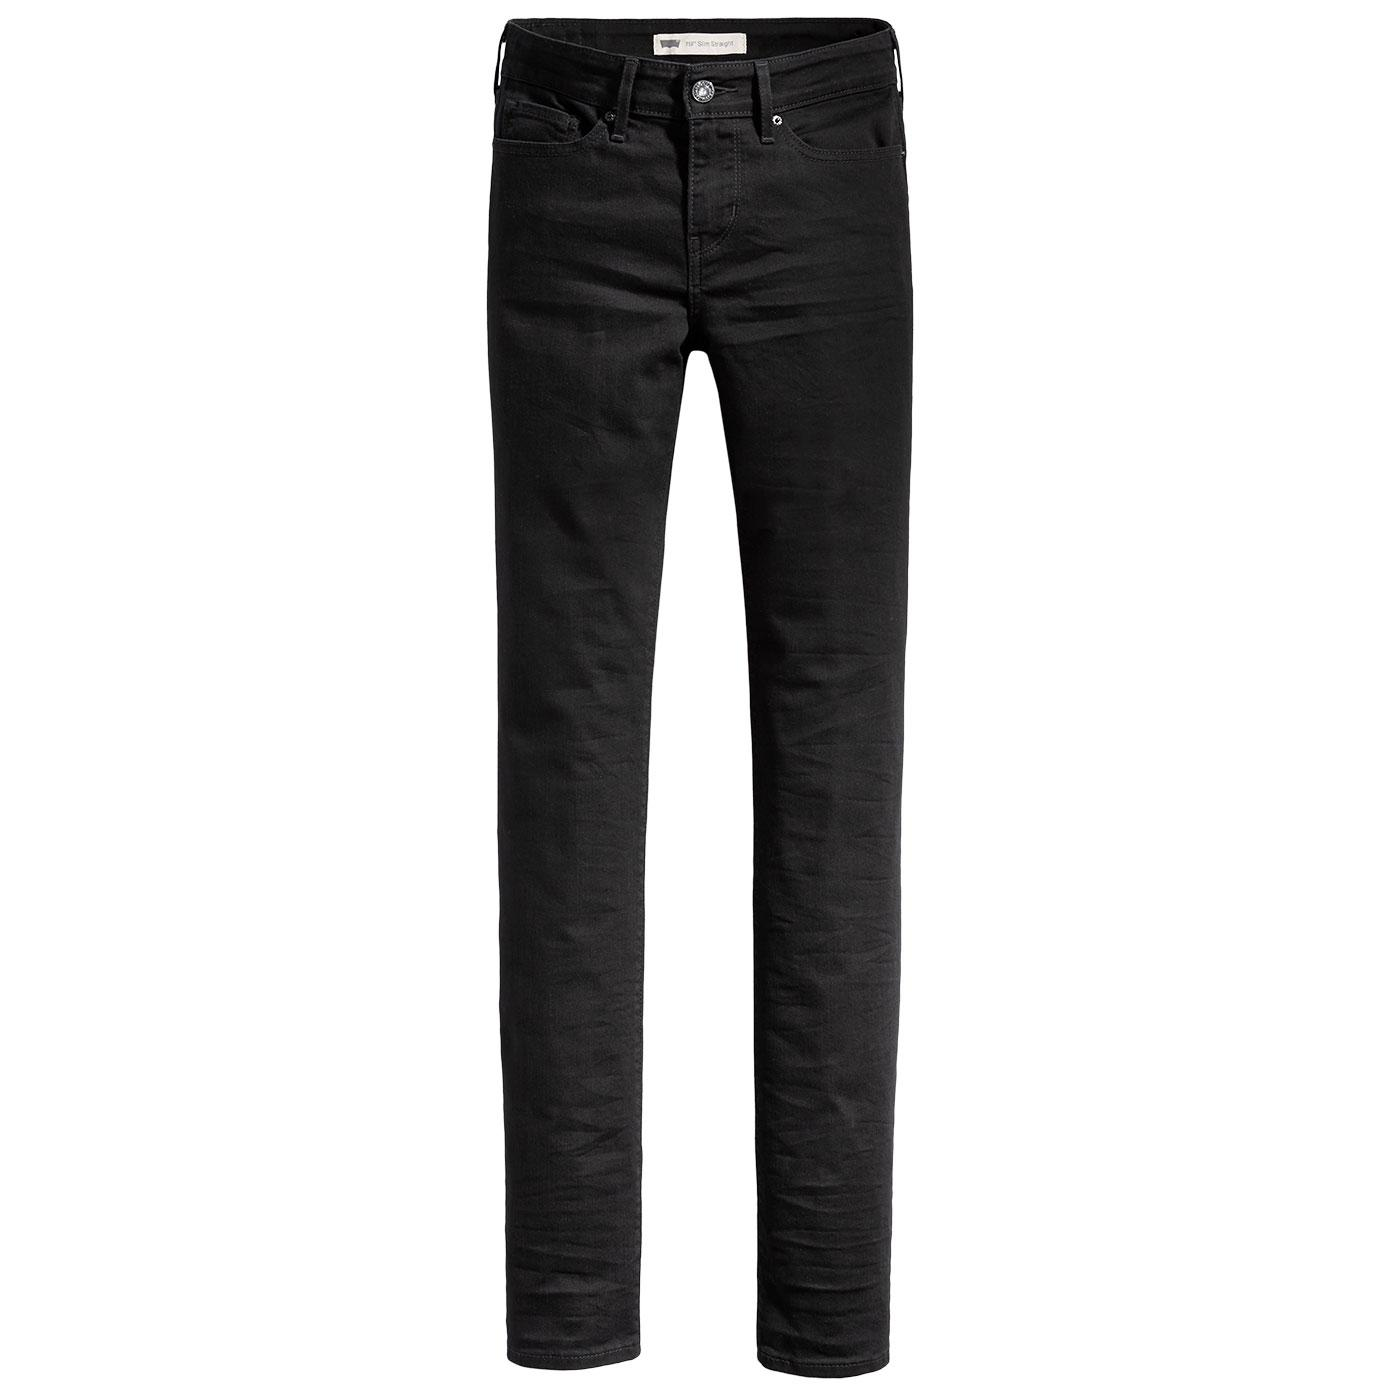 LEVI'S Women's 712 Slim Leg Jeans - Black Sheep